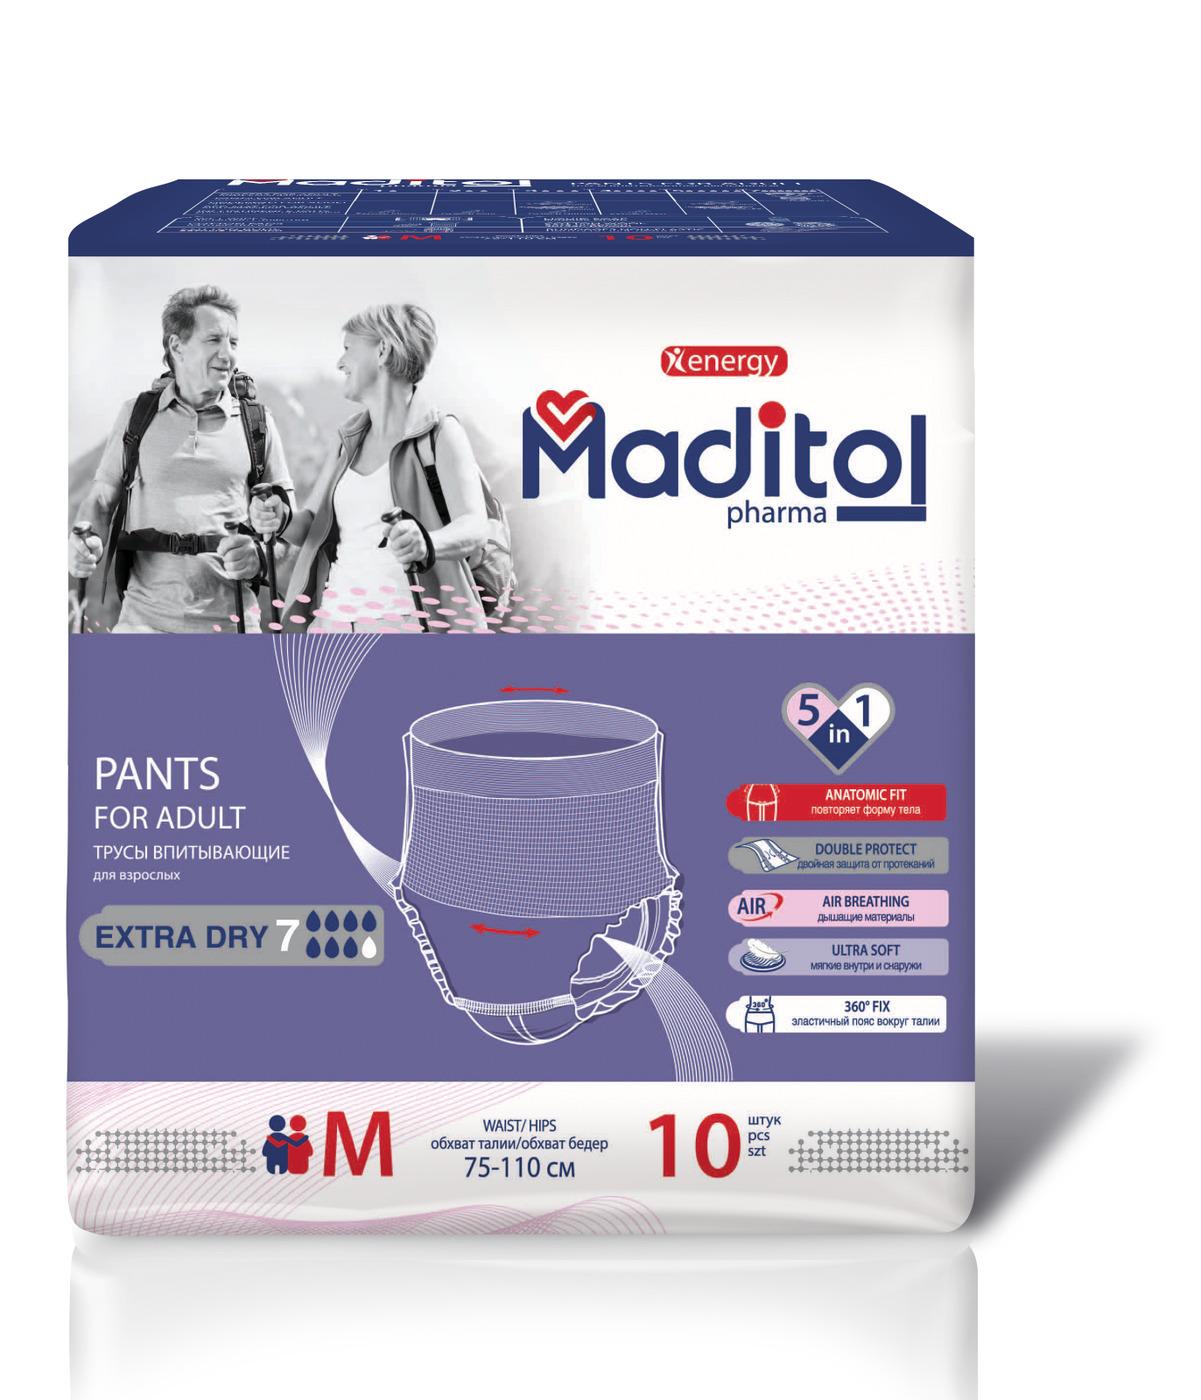 Трусы для взрослых Maditol Размер М обхват